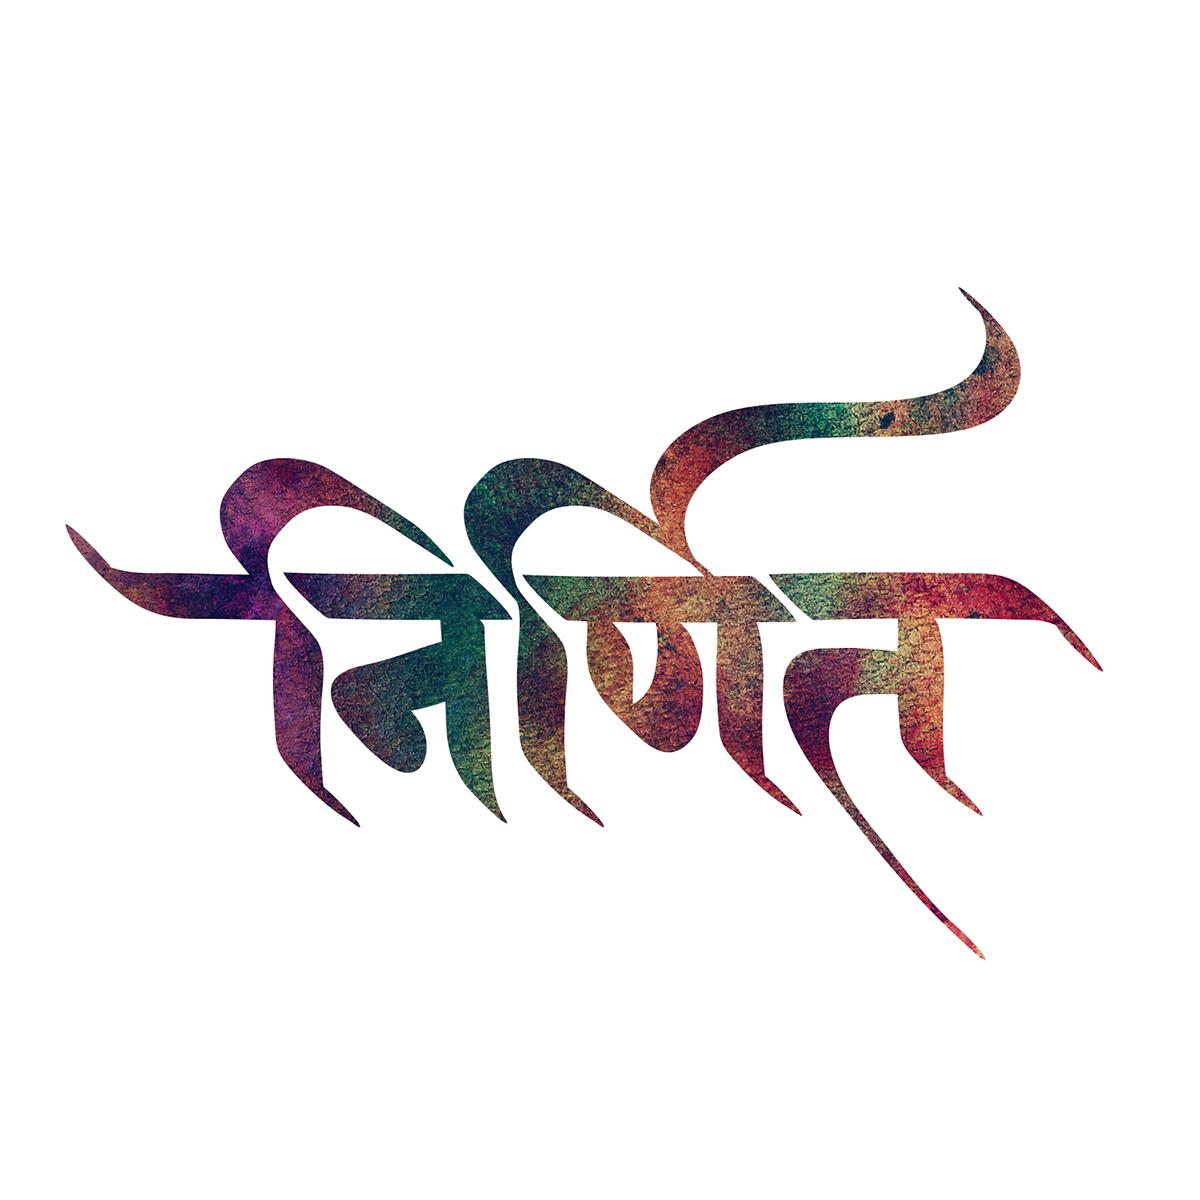 Keptalalat A Kovetkezore Devanagari Calligraphy